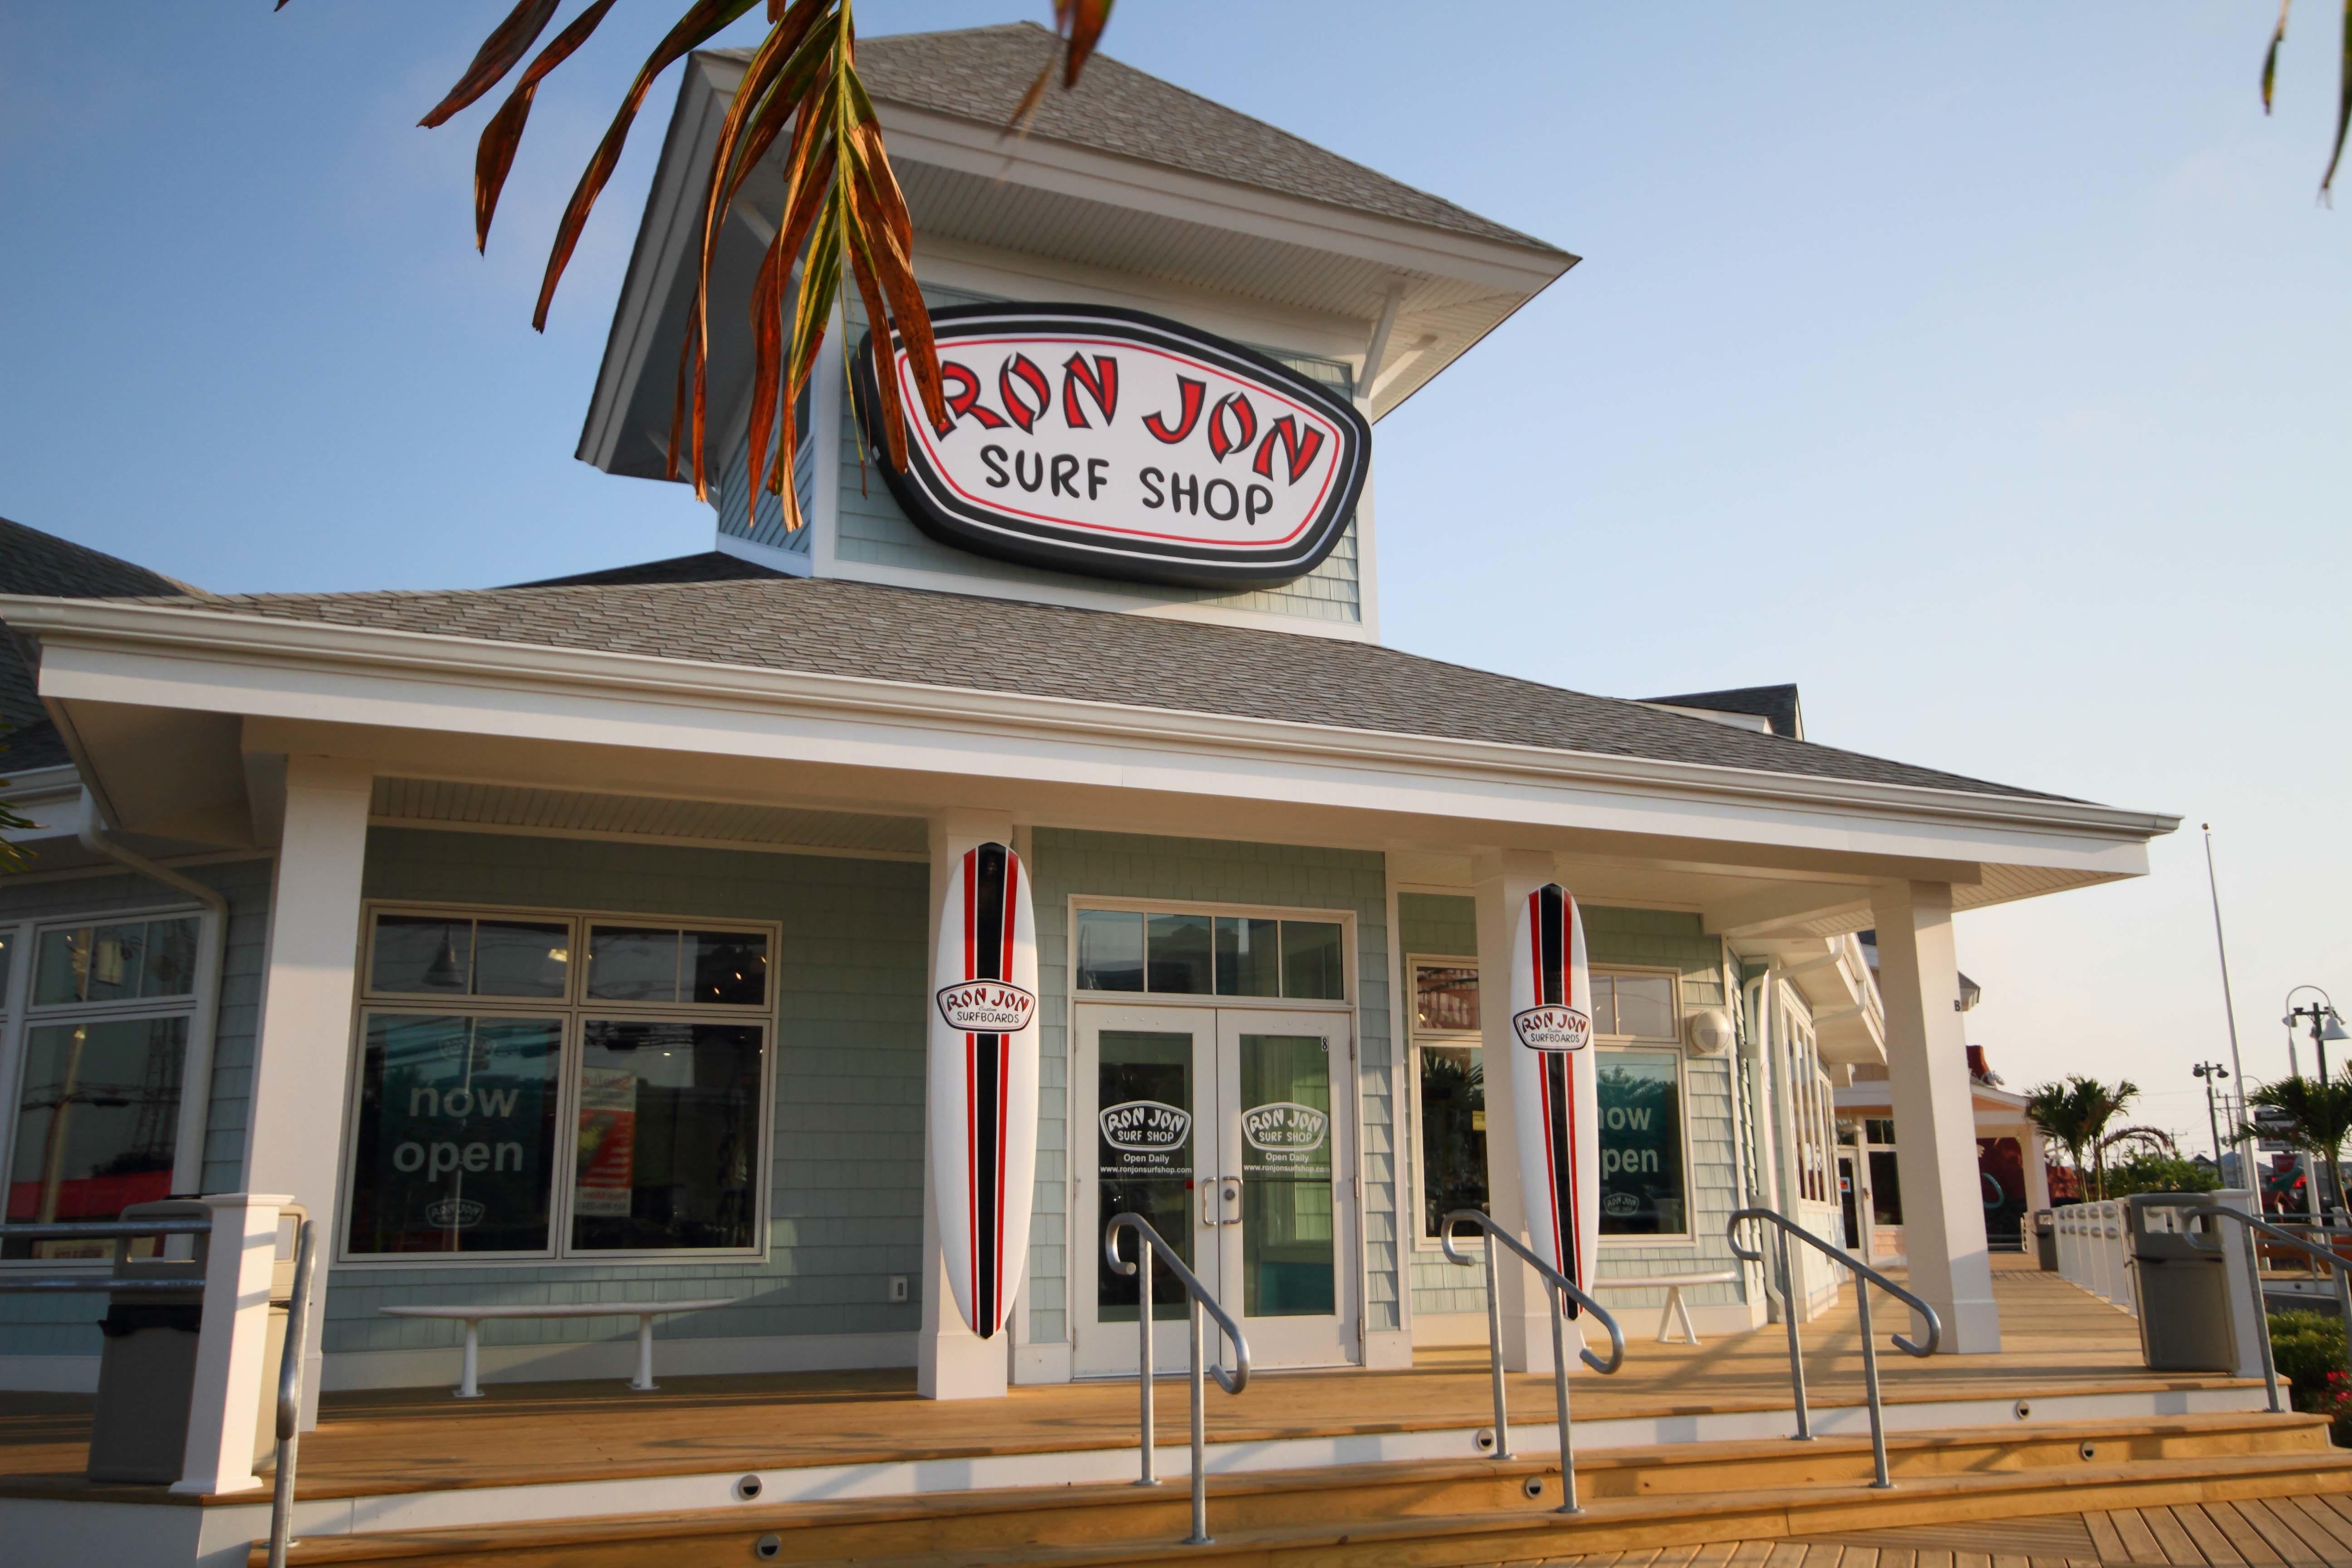 Ron Jon Surf Shop image 5